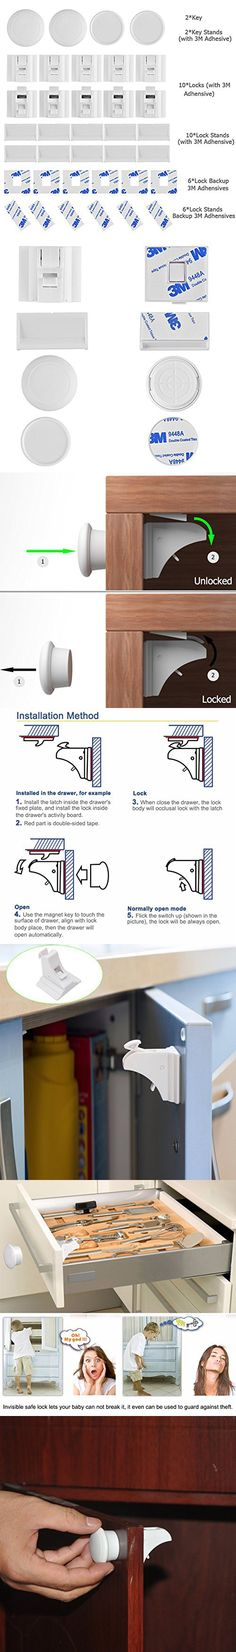 Balfer Baby Safety Magnetic Cabinet Lock Set No Drilling (10 Locks + 2 Keys)